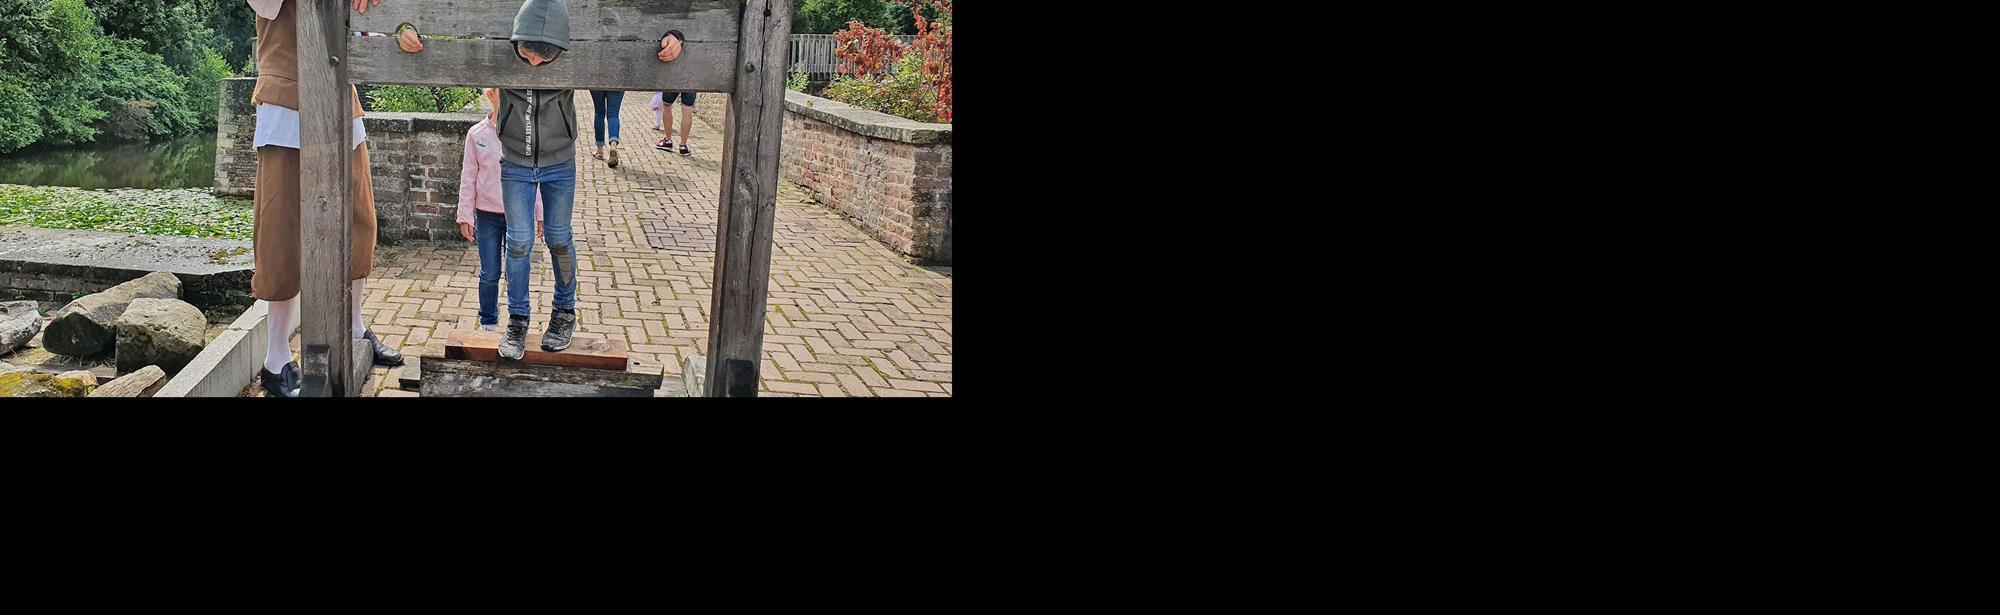 Stichting Landgoed Slot Schaesberg